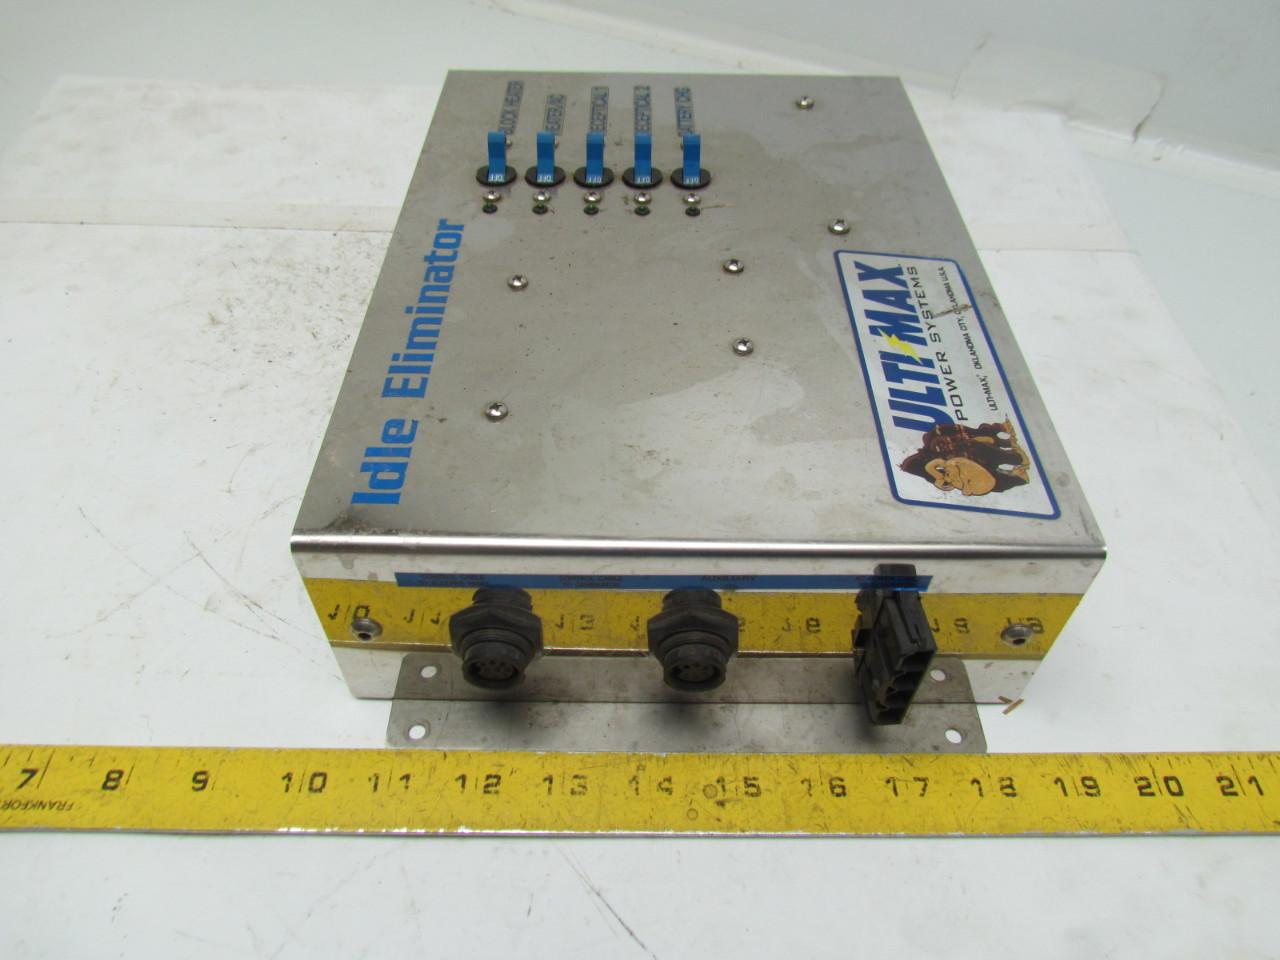 Semi Truck Control Panel : Ultimax idle eliminator control box panel semi truck no